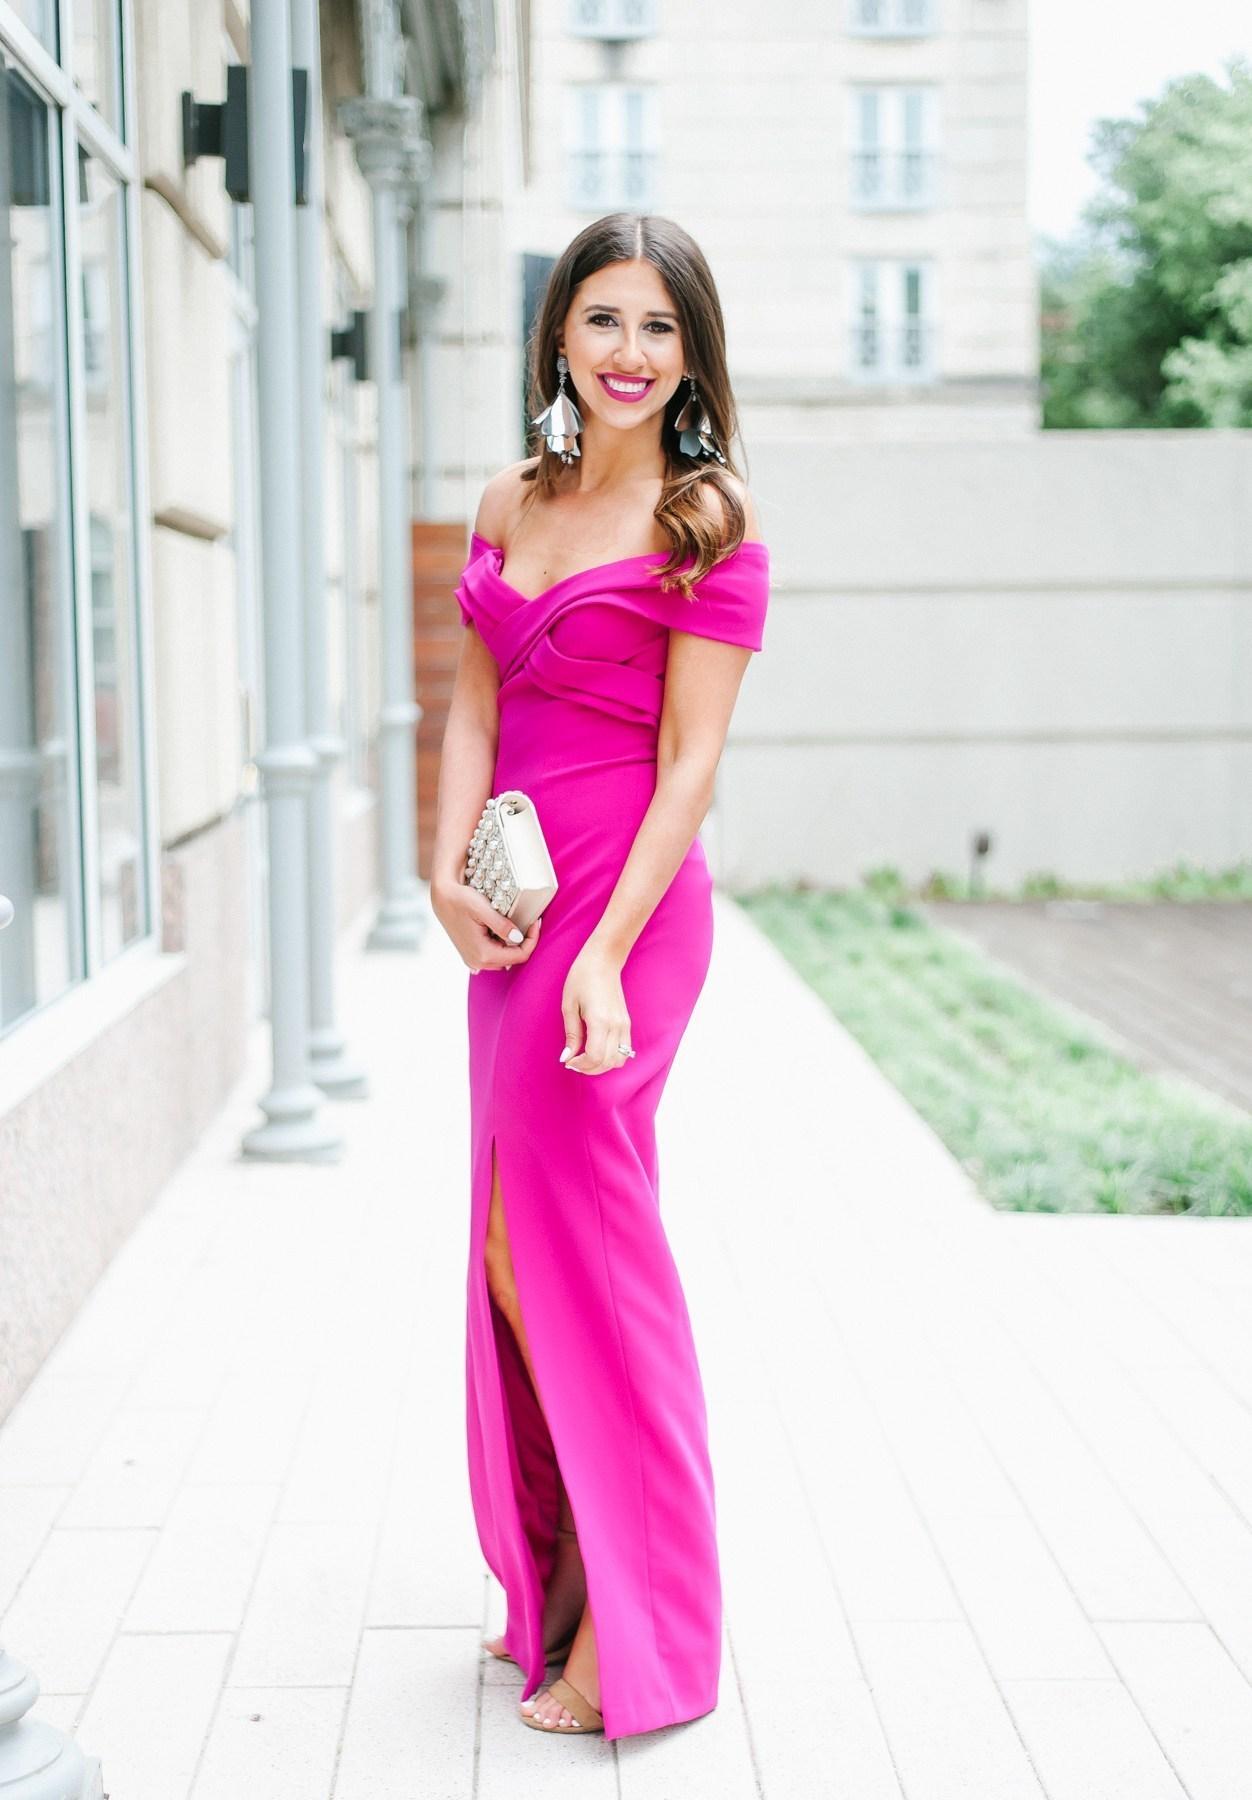 Women\'s Hot Pink Evening Dress, Tan Leather Heeled Sandals, Beige ...